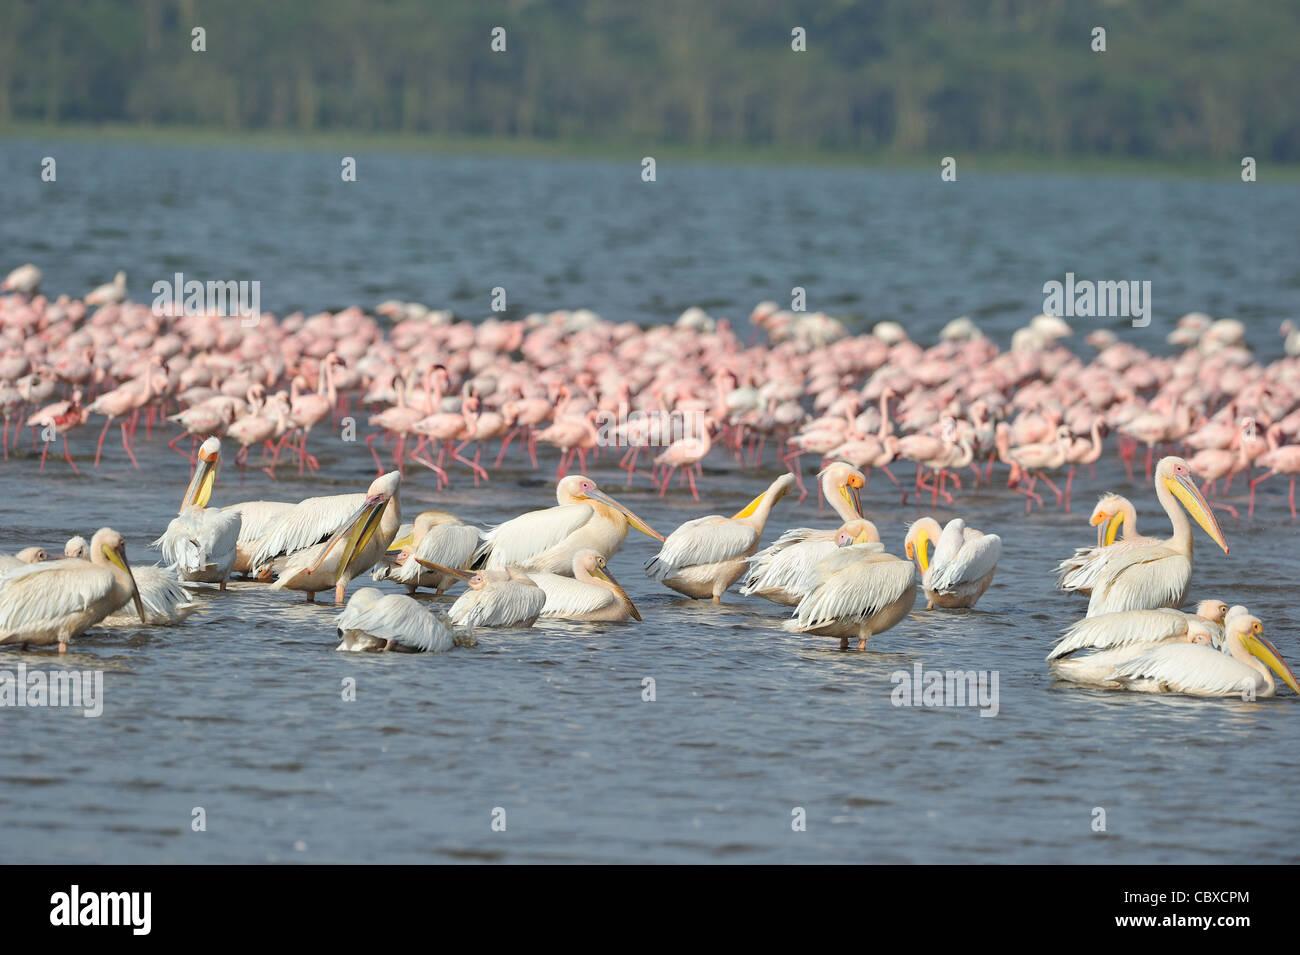 Flock of Great white pelican (Pelecanus onocrotalus) bathing near a flock of Lesser flamingo (Phoeniconaias minor) Stock Photo